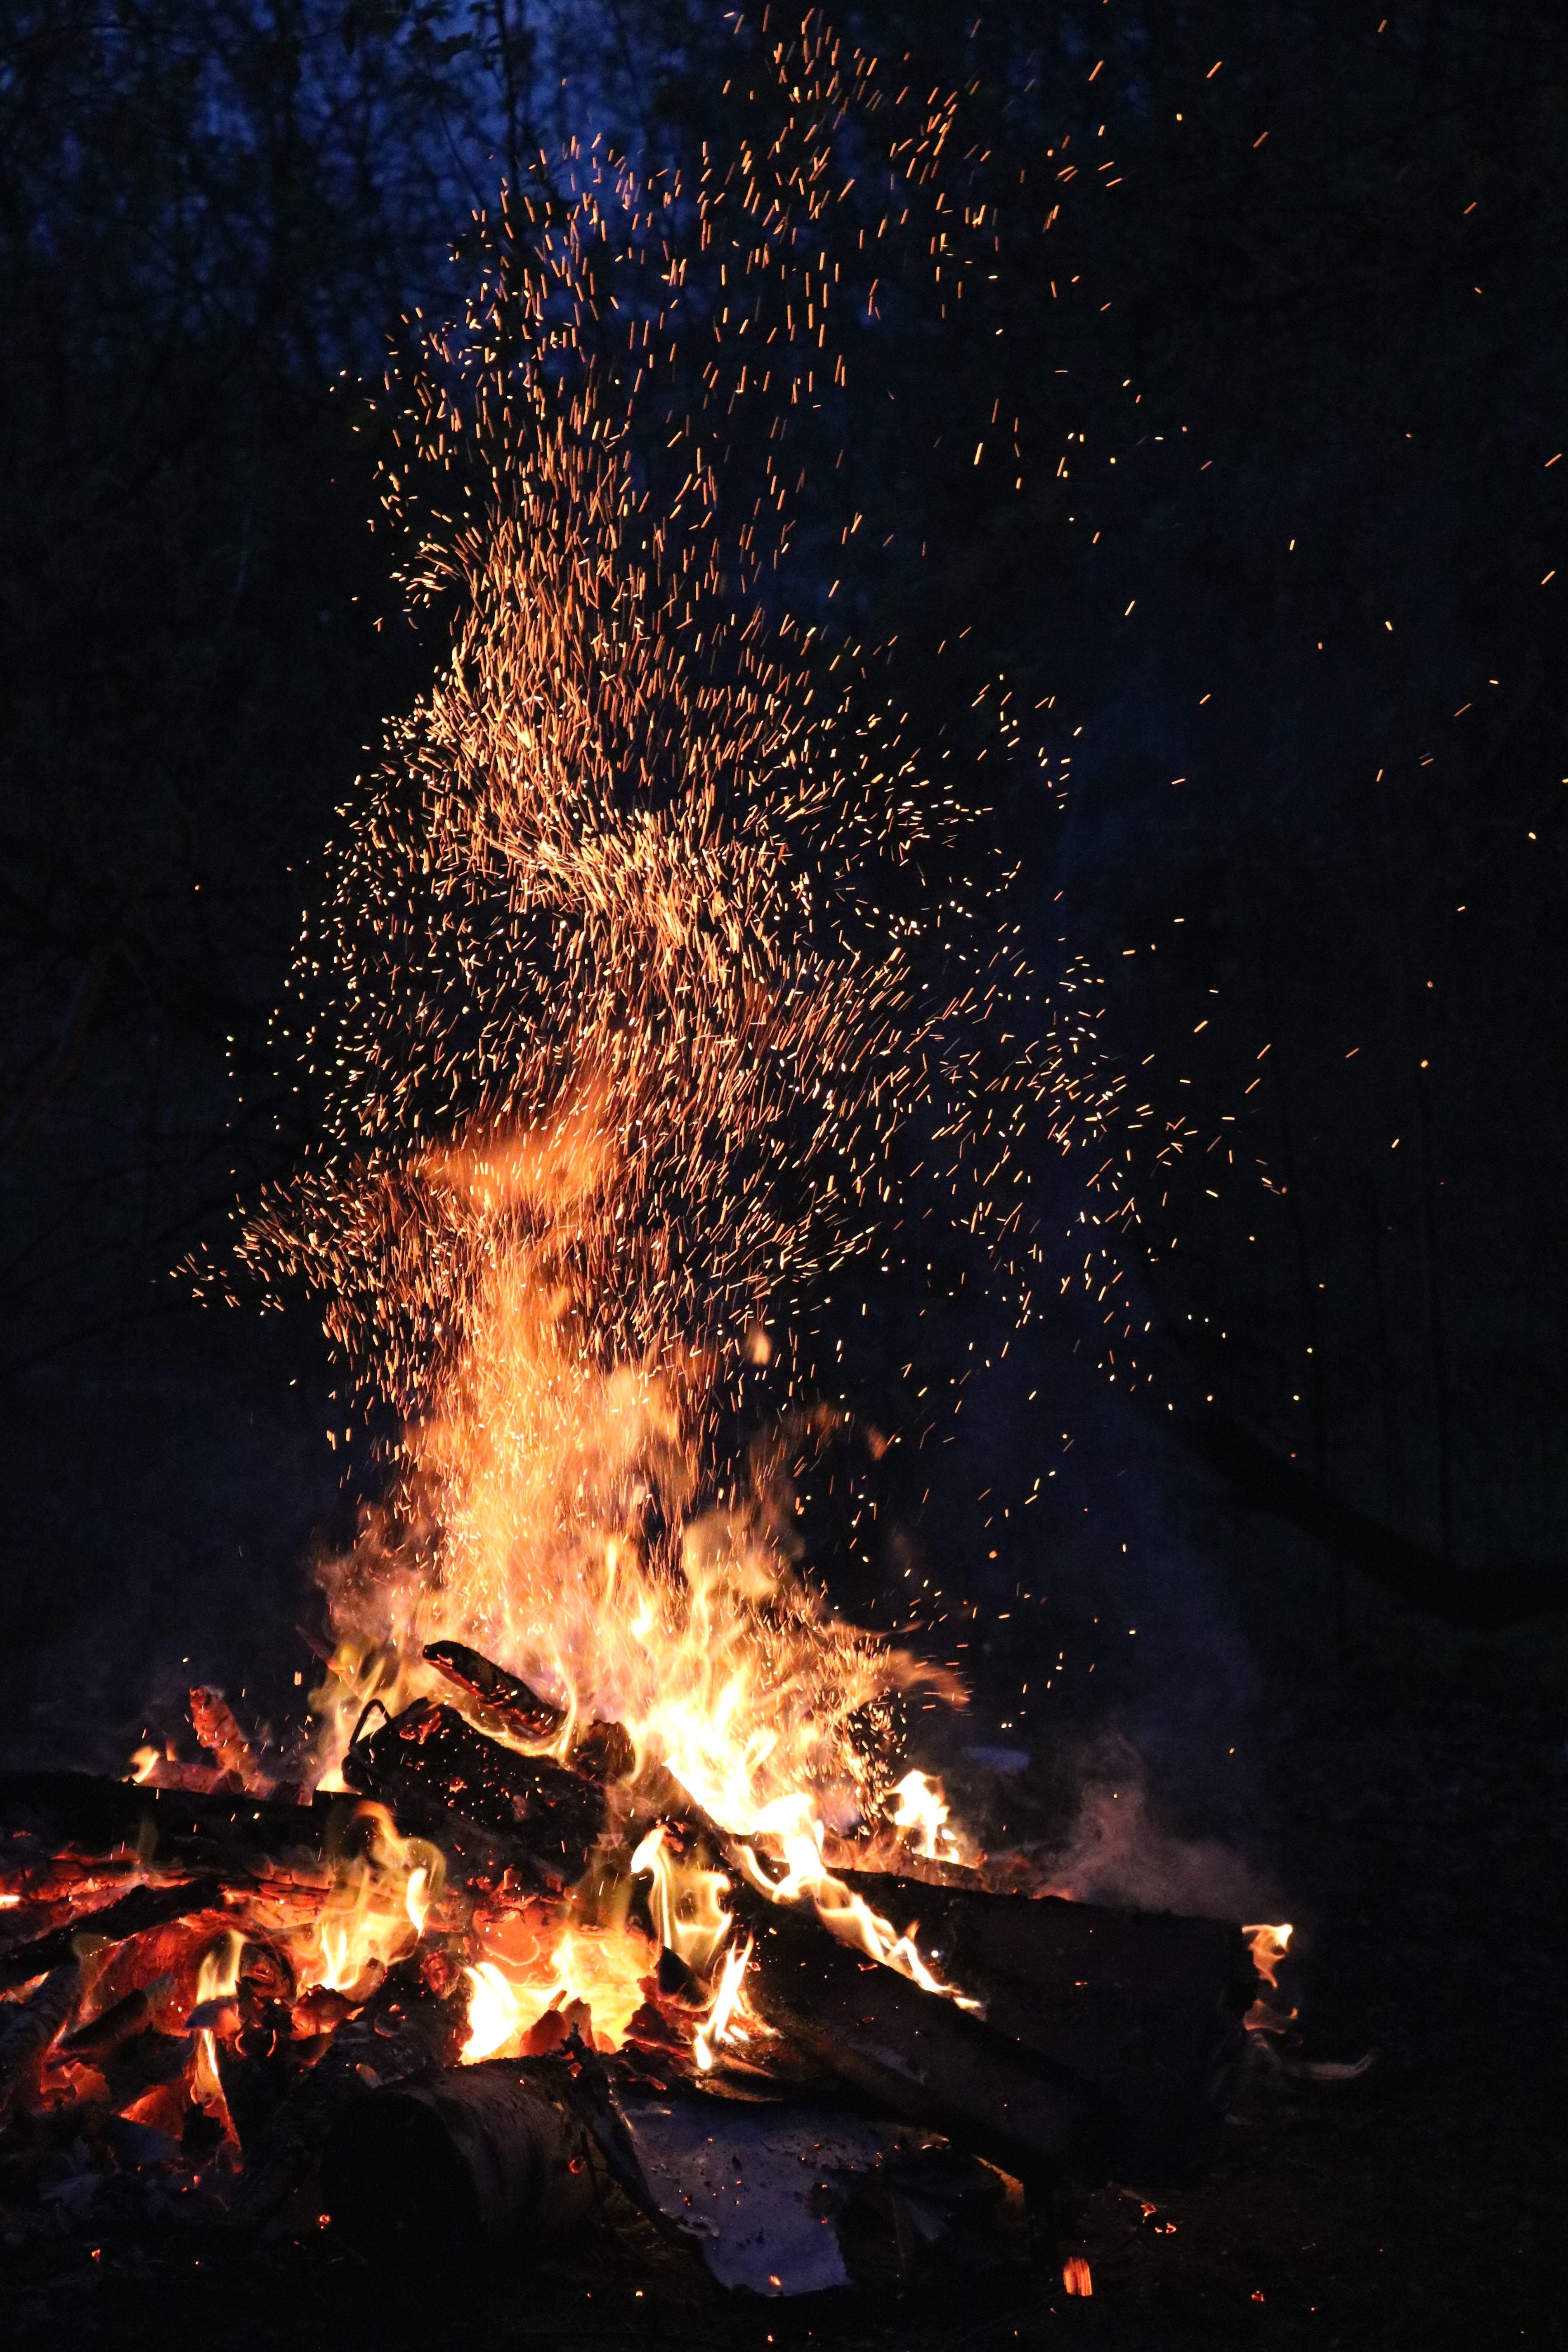 Wallpaper Hd Portrait Orientation Free Picture Fire Firewood Flame Forest Heat Hot